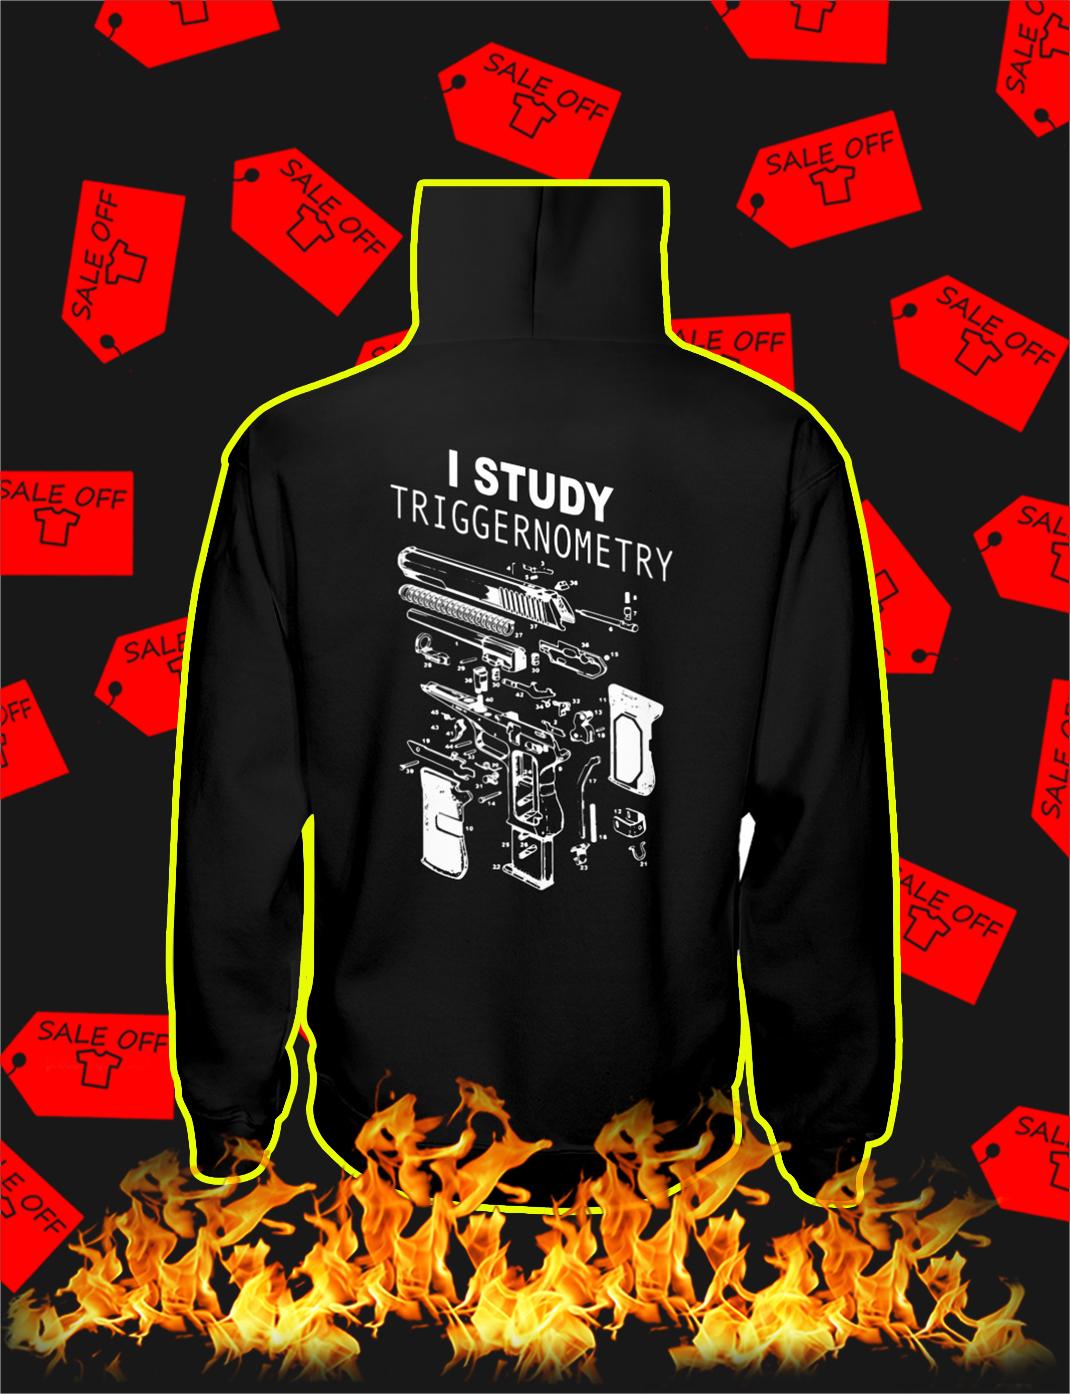 ™ (Sale Off) I Study Triggernometry shirt